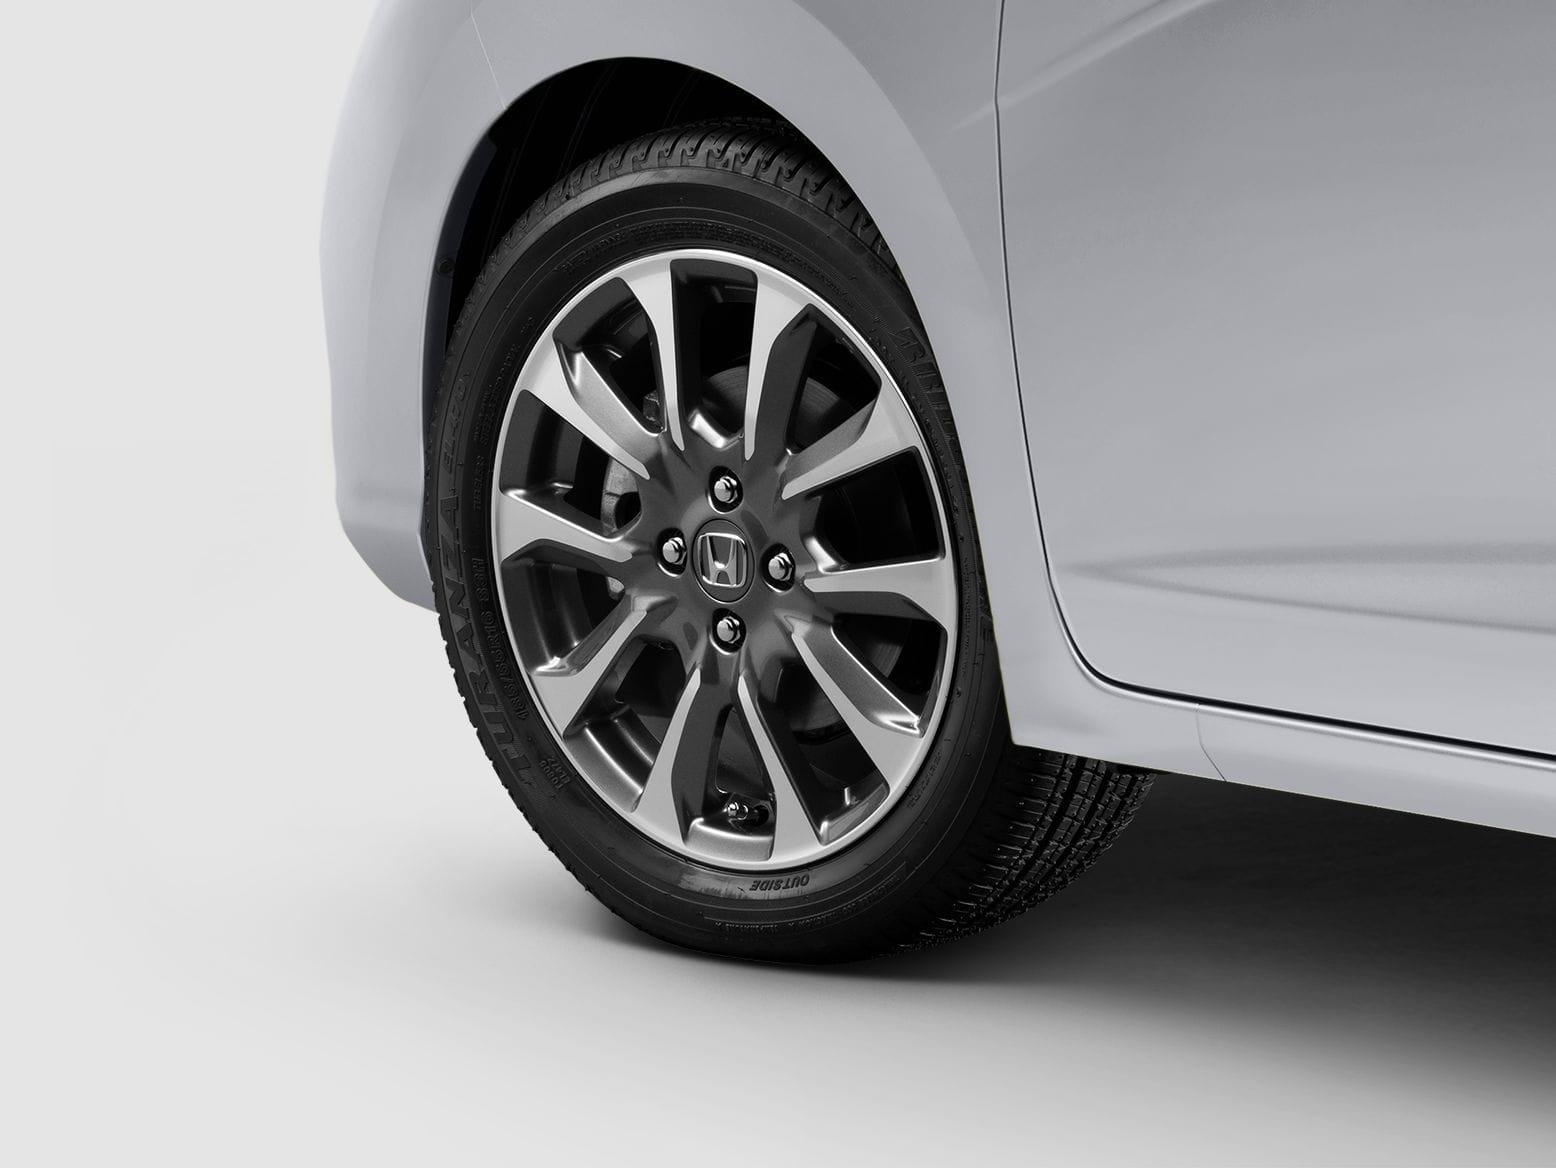 Honda Online Store 2018 Fit 16 Inch Diamond Cut Silver Alloy Wheel